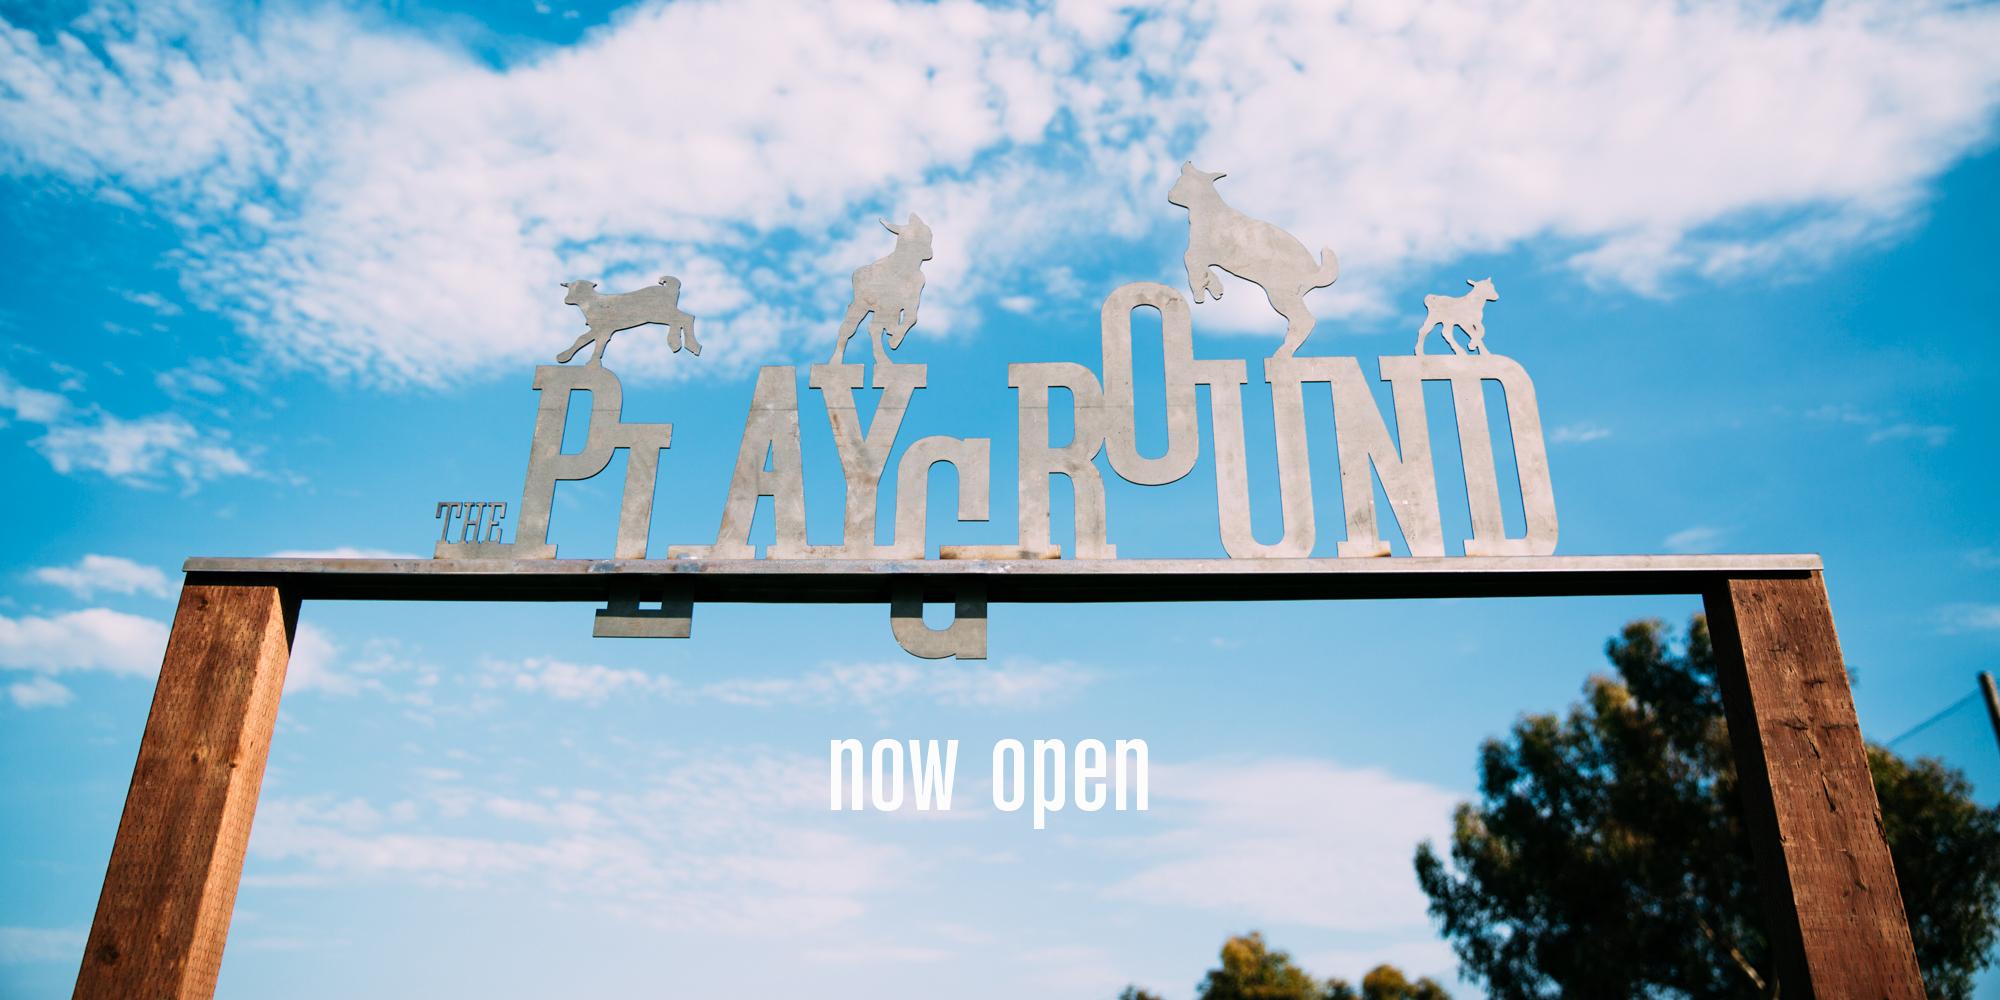 the-playground-now-open.jpg